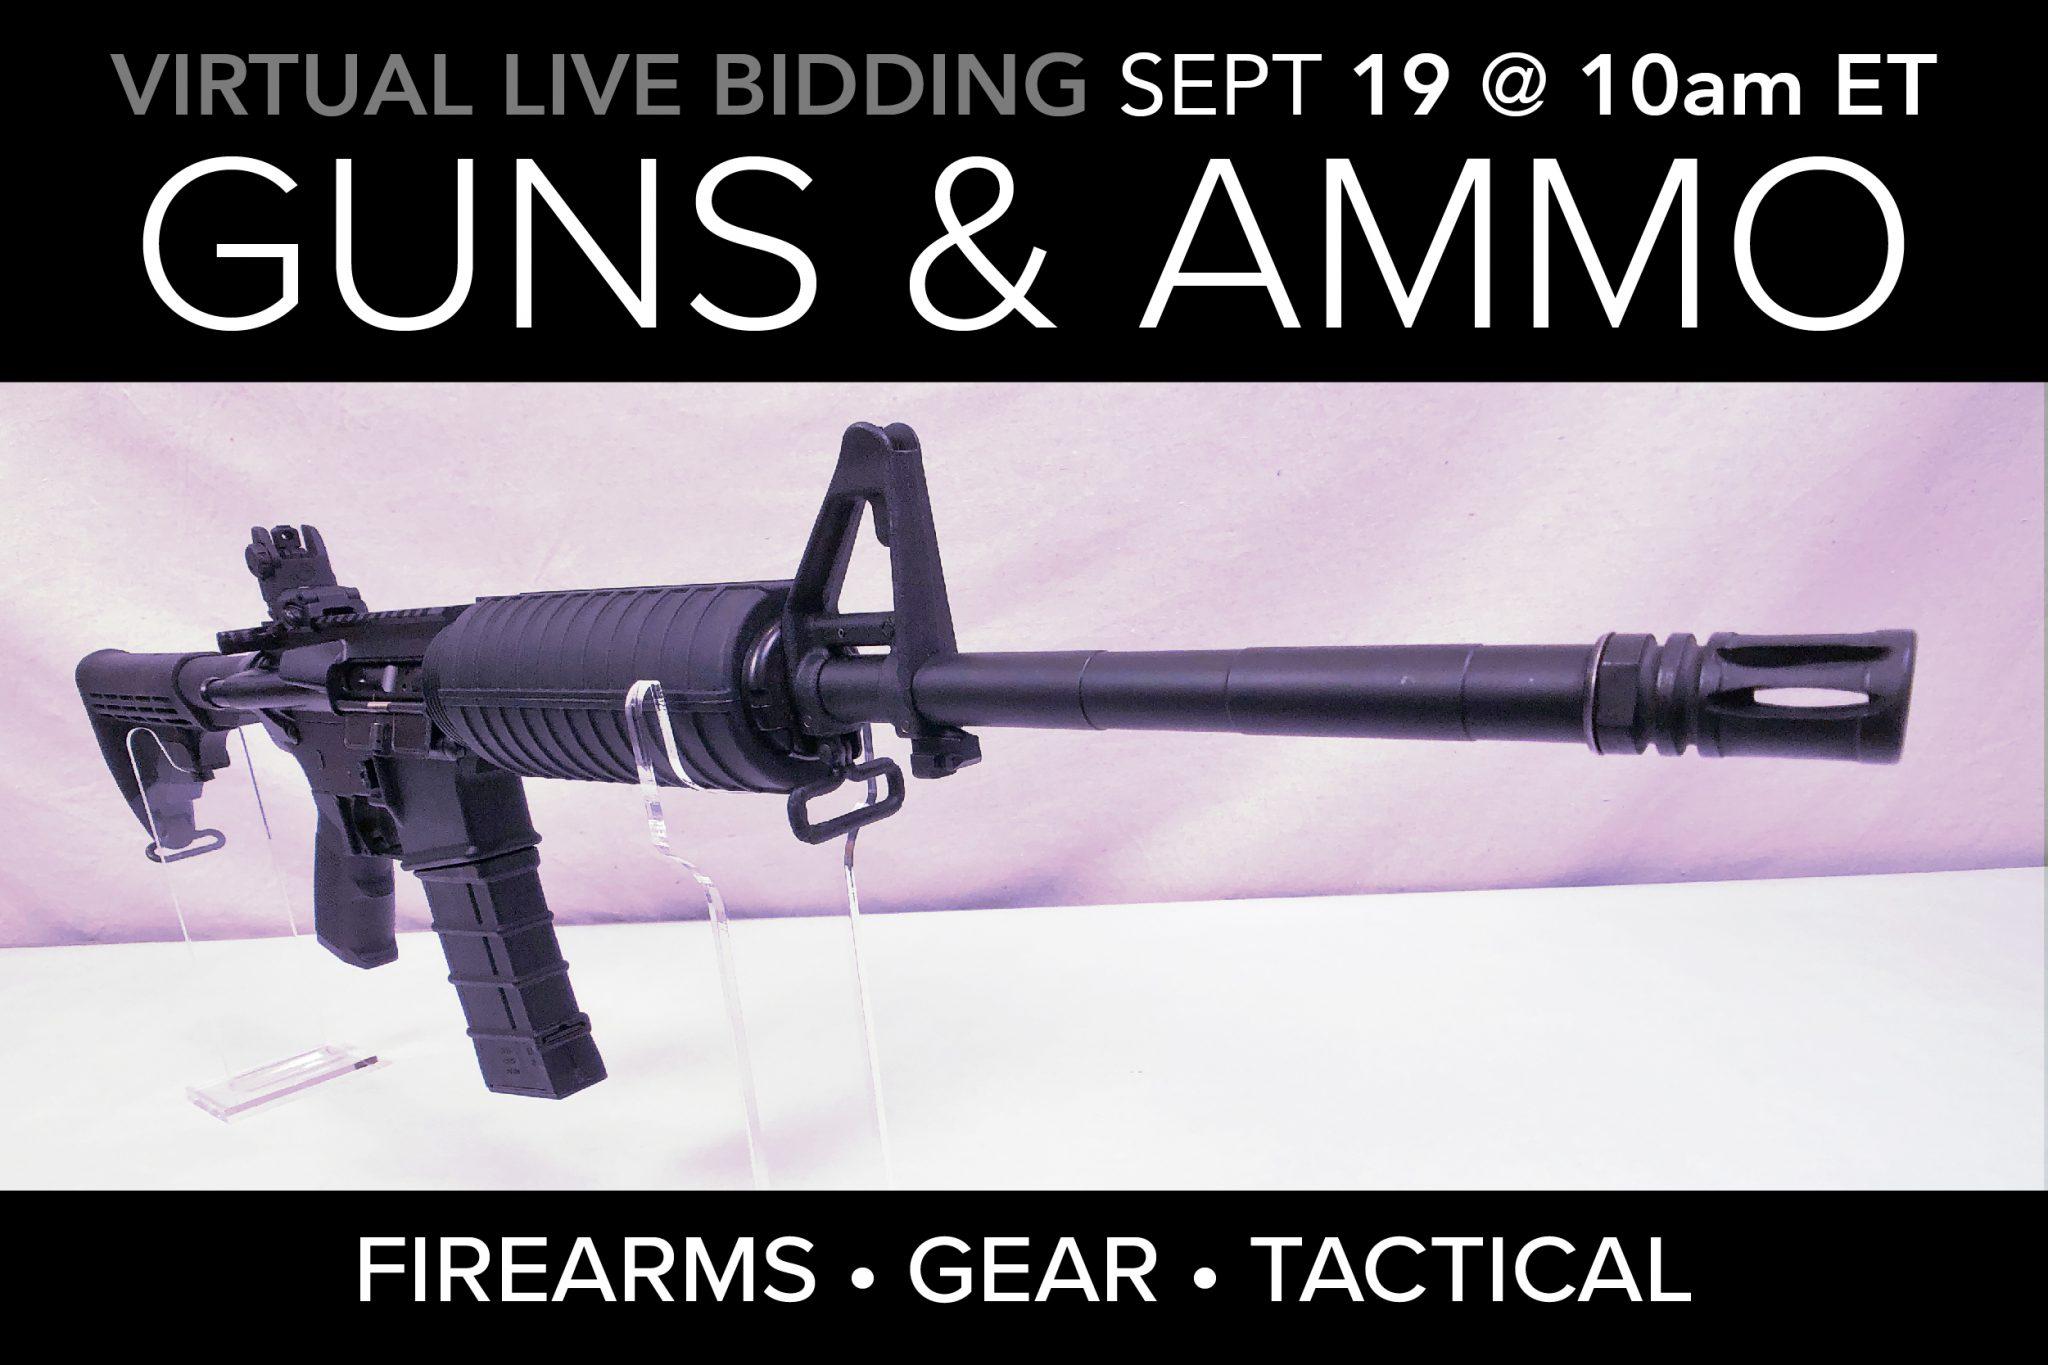 September Public Auction Firearms Guns Ammo Ammunition Gear Tactical Auction